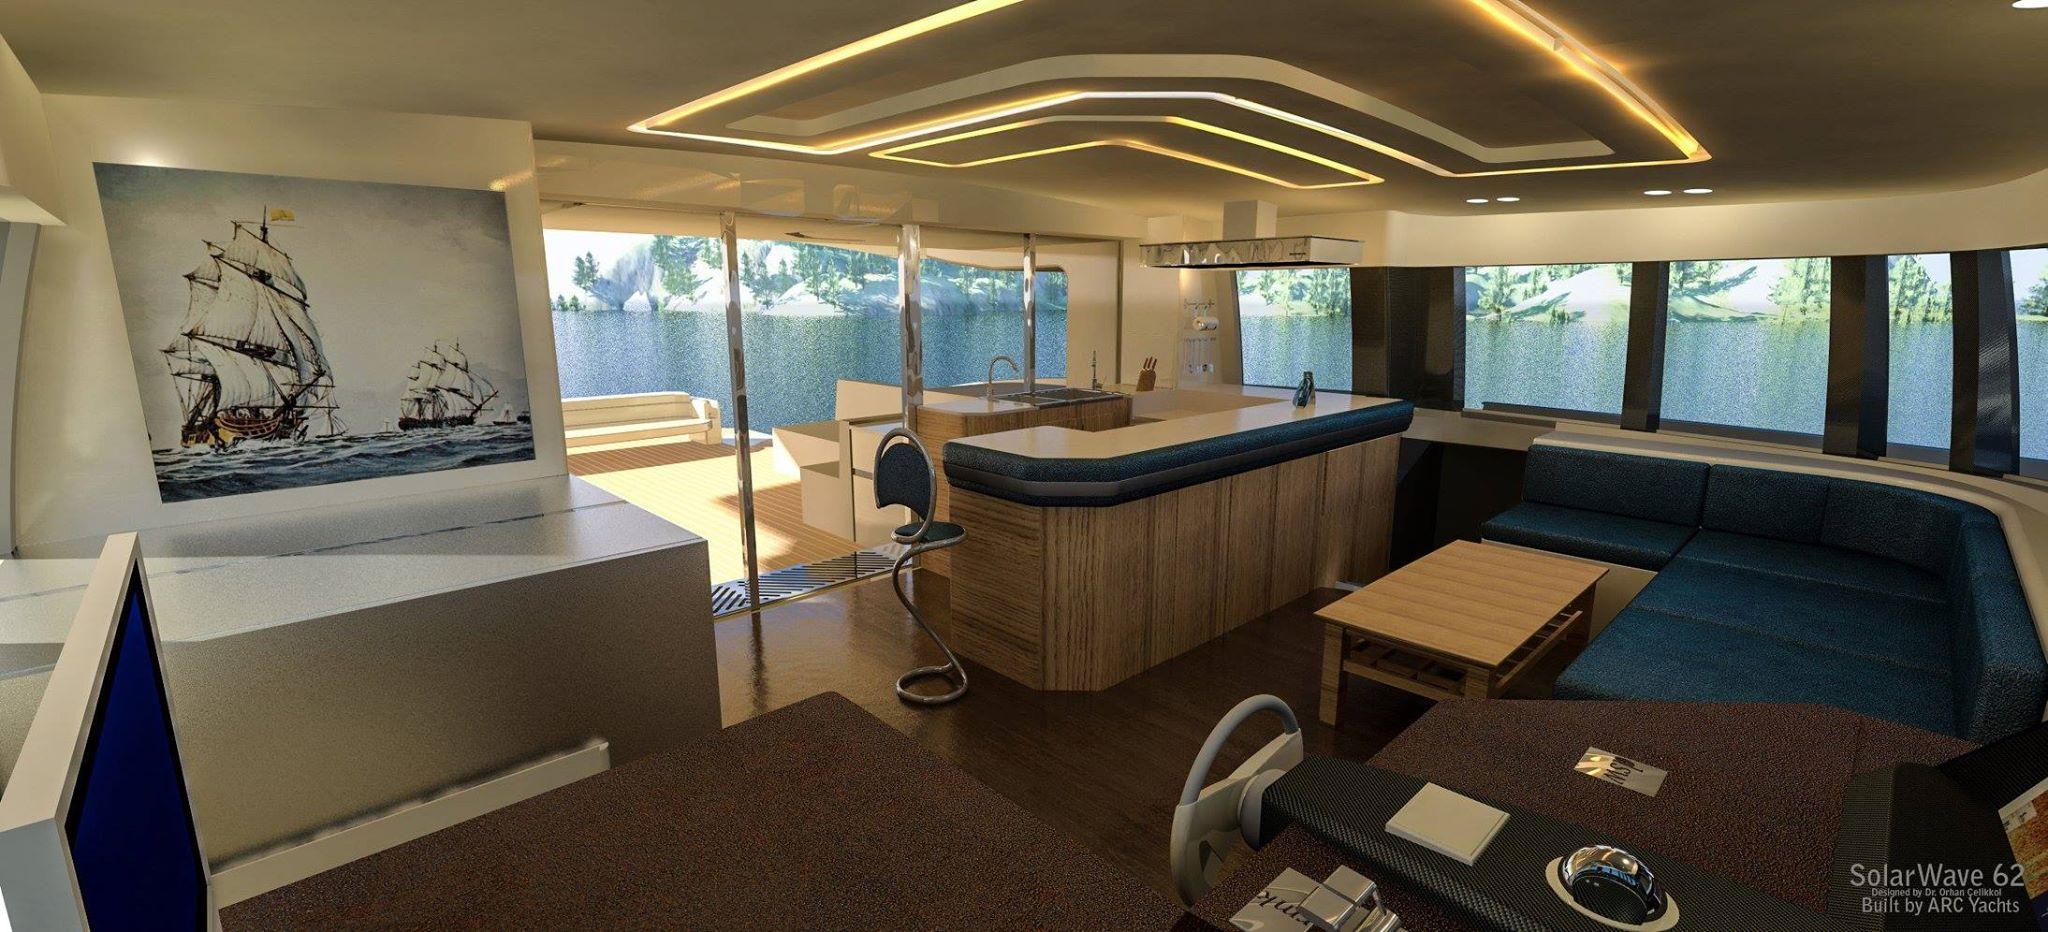 Solarwave 62' interior rendering